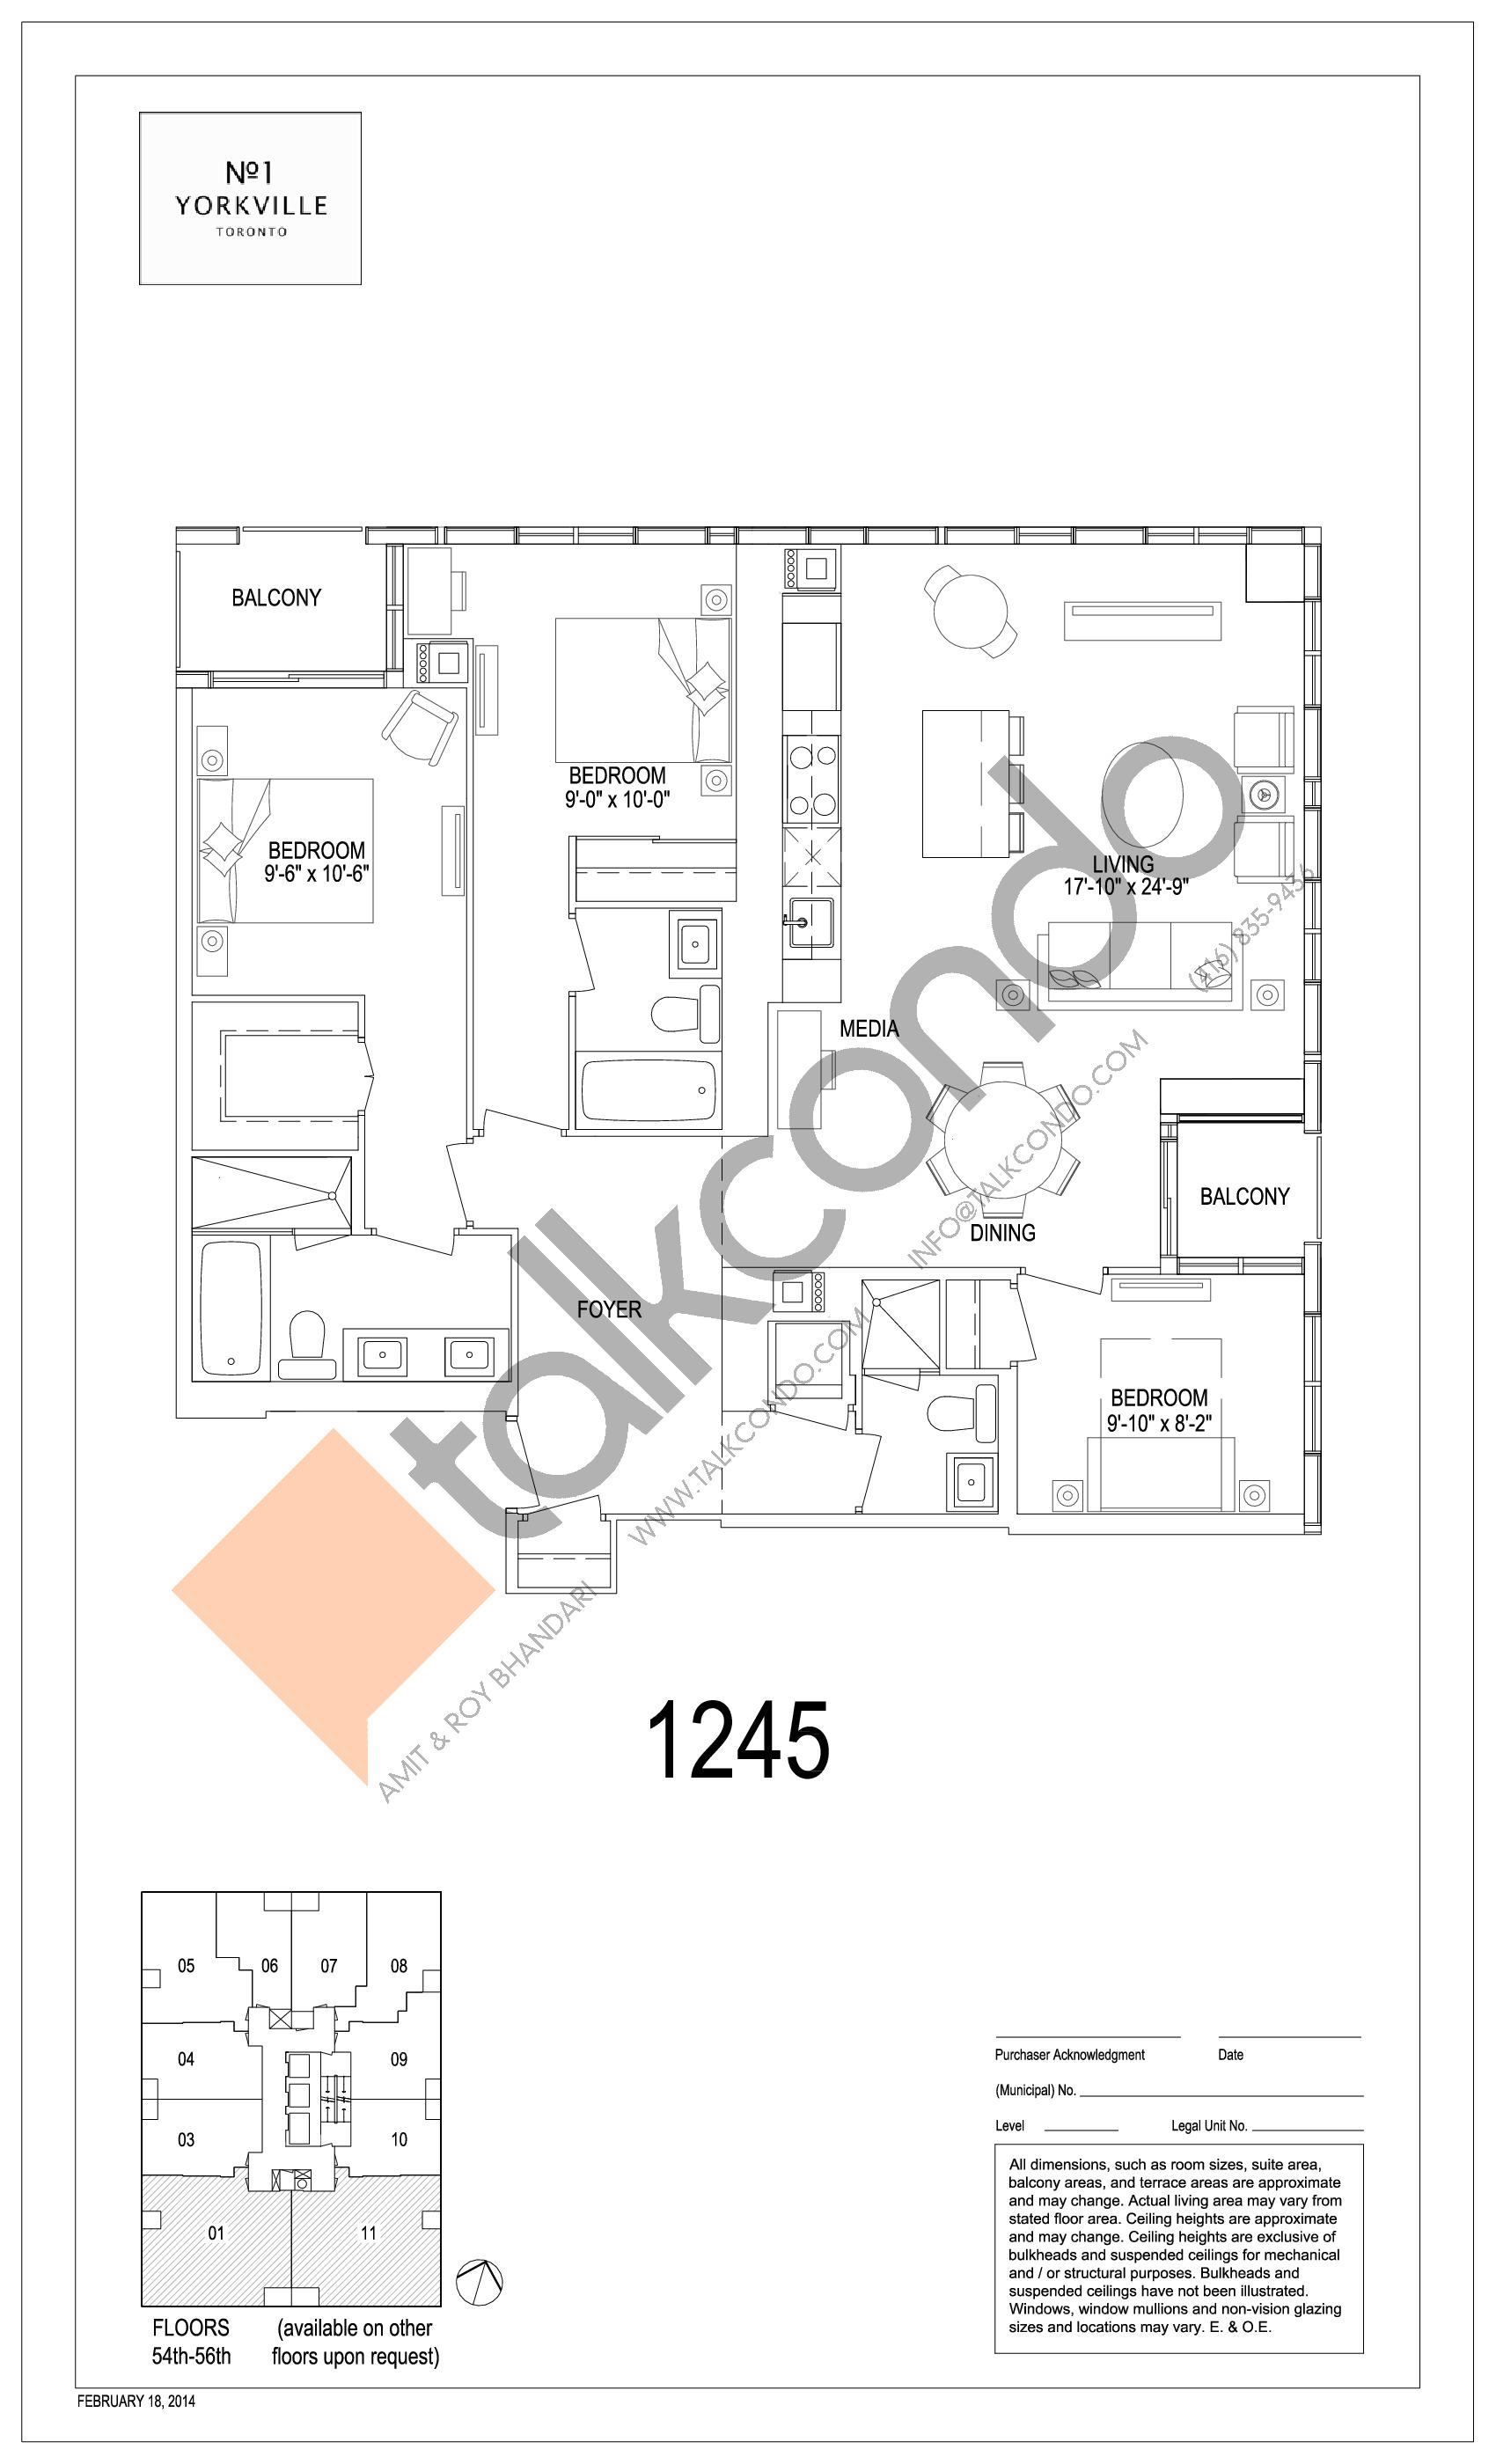 1245 Floor Plan at 1 Yorkville Condos - 1245 sq.ft